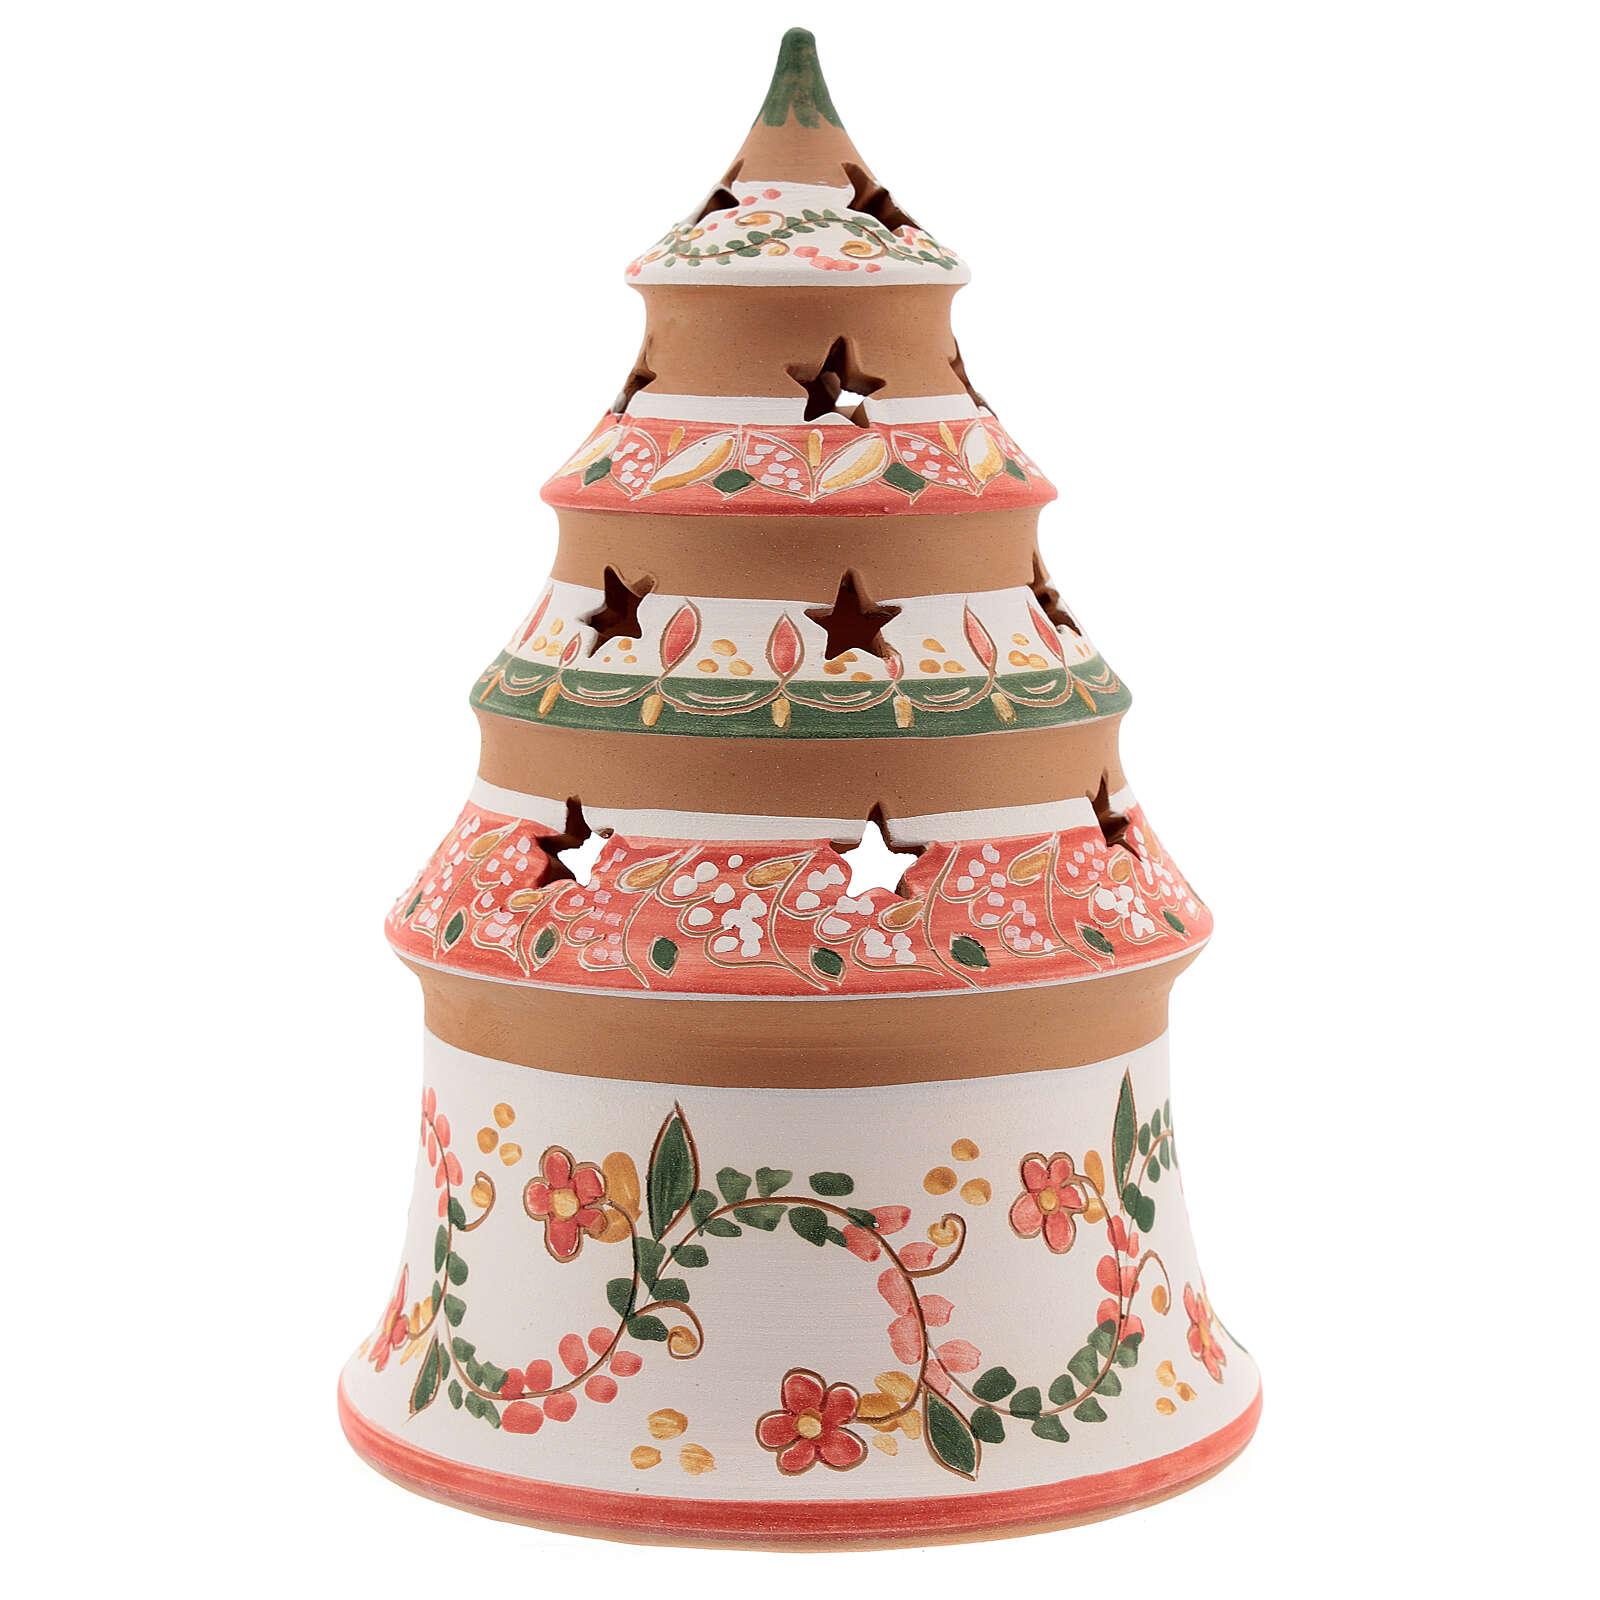 Tealight nativity terracotta Deruta 20 cm red 4